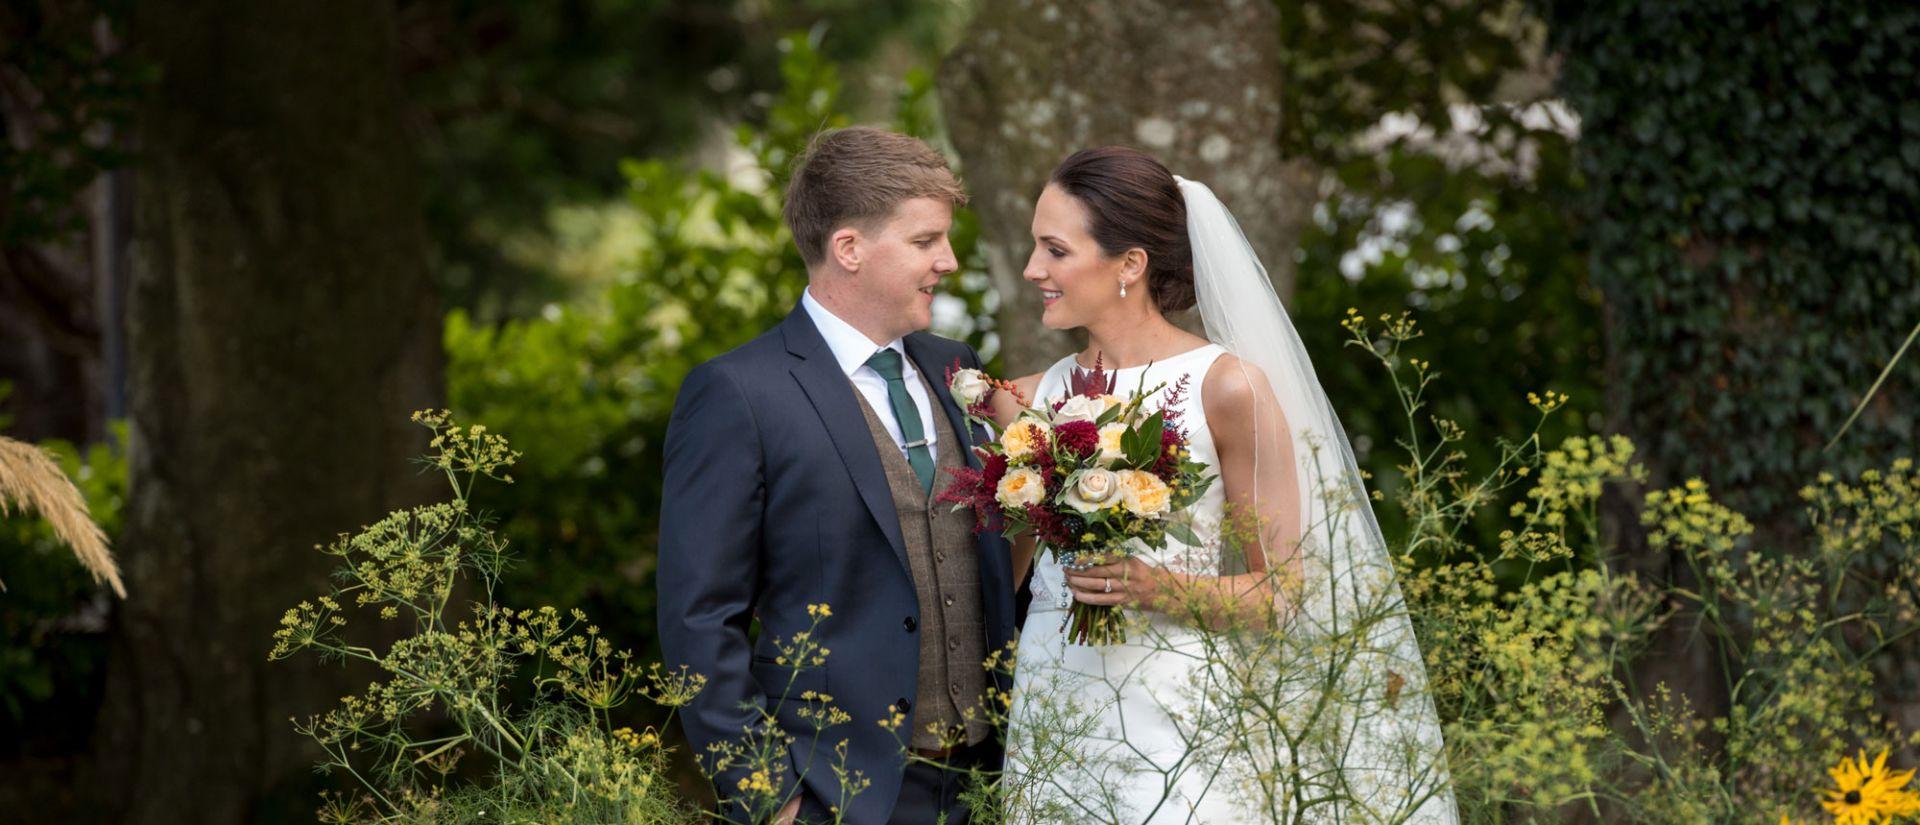 d1ad0f8a445 Testimonials - Our Weddings   Raheen Woods Hotel